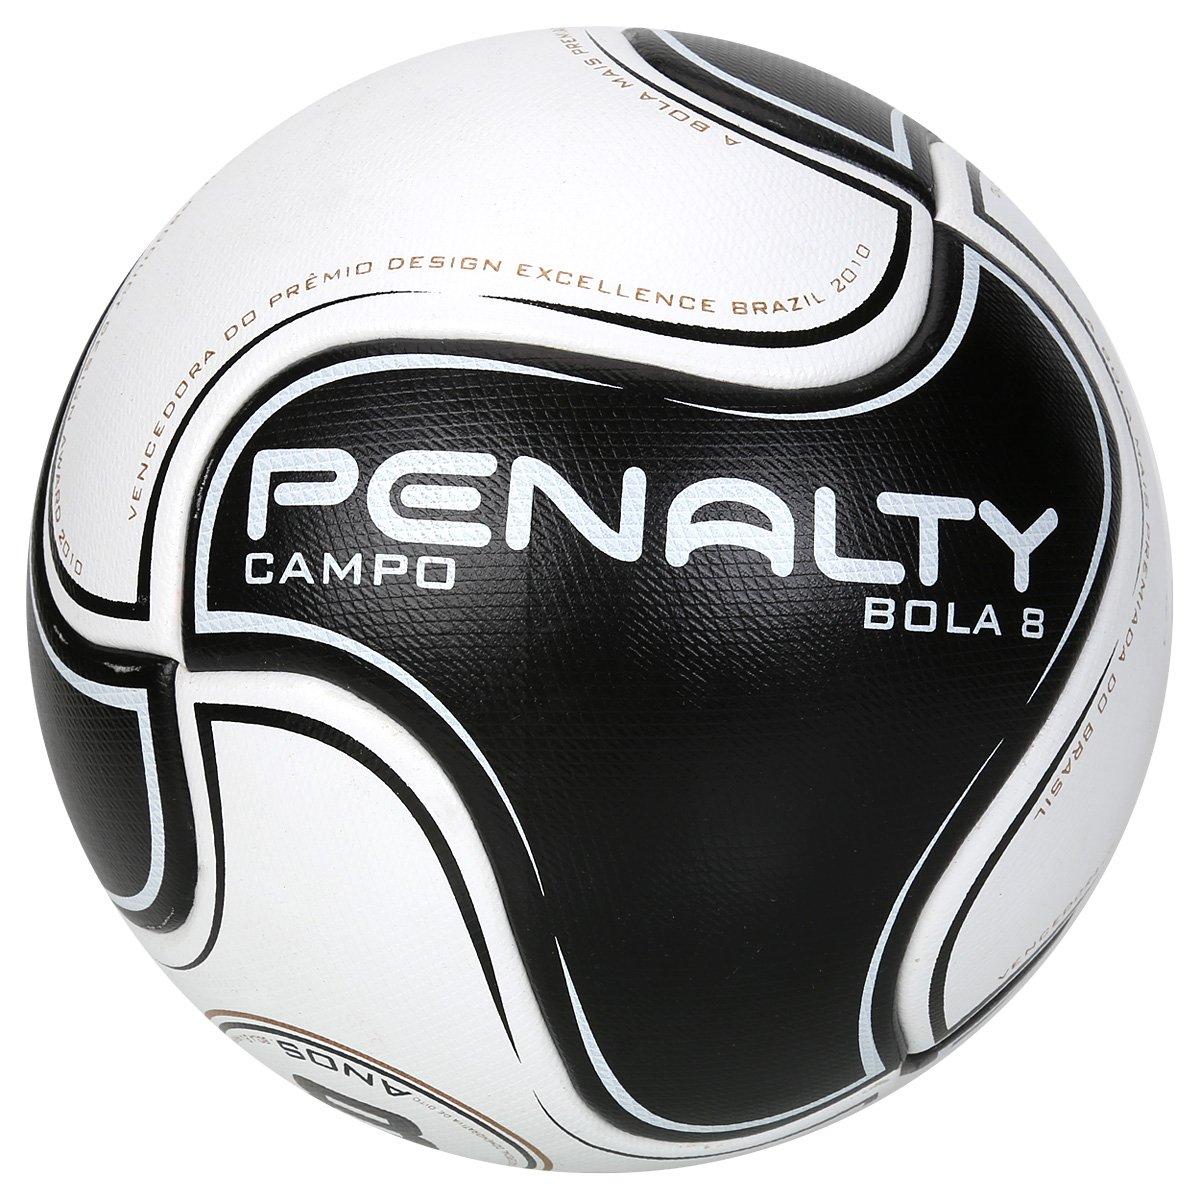 1669f0e984f71 Bola Futebol Campo Penalty 8 S11 R2 6 - Compre Agora